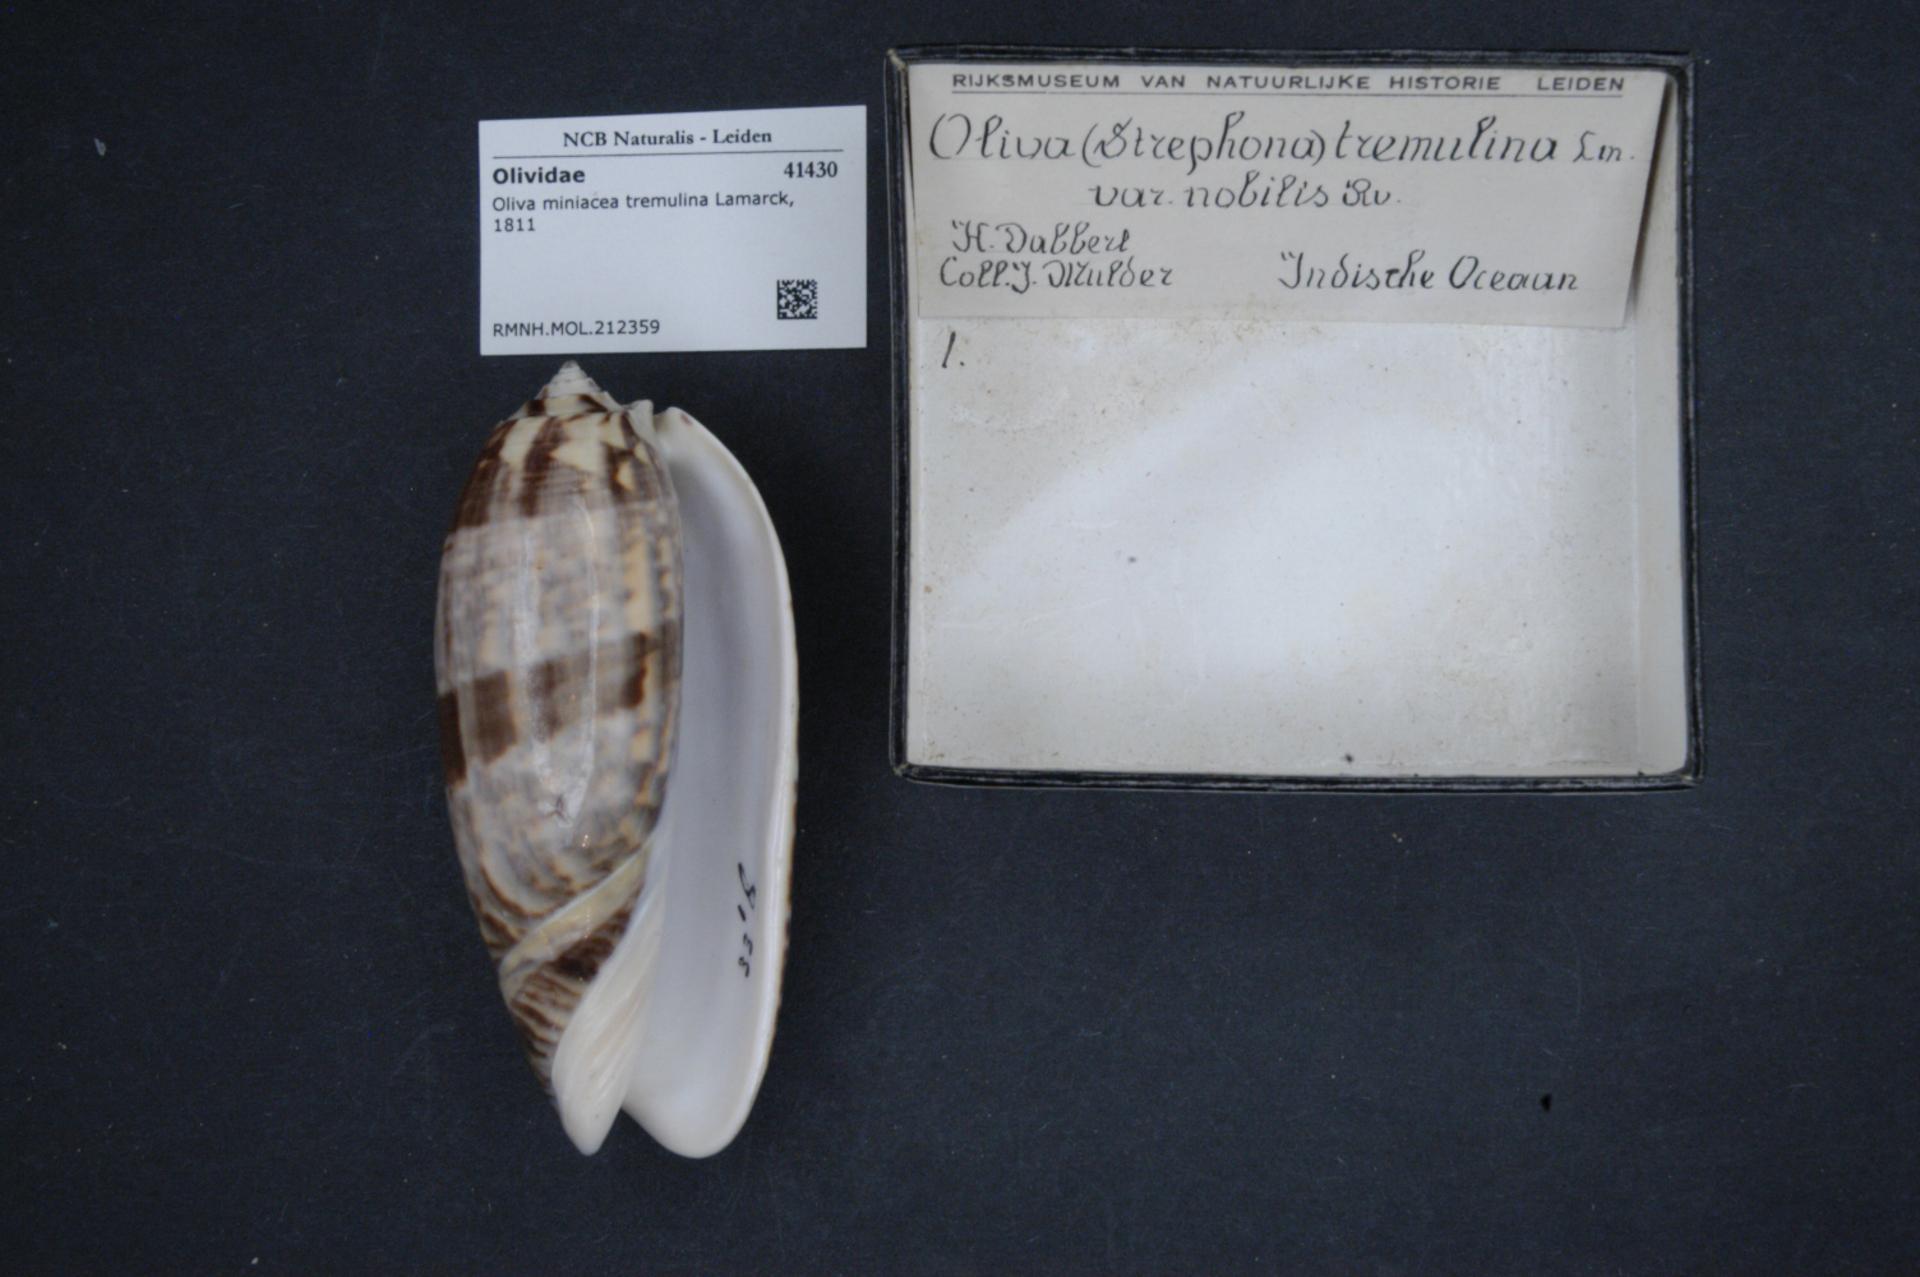 File:Naturalis Biodiversity Center - RMNH MOL 212359 - Oliva